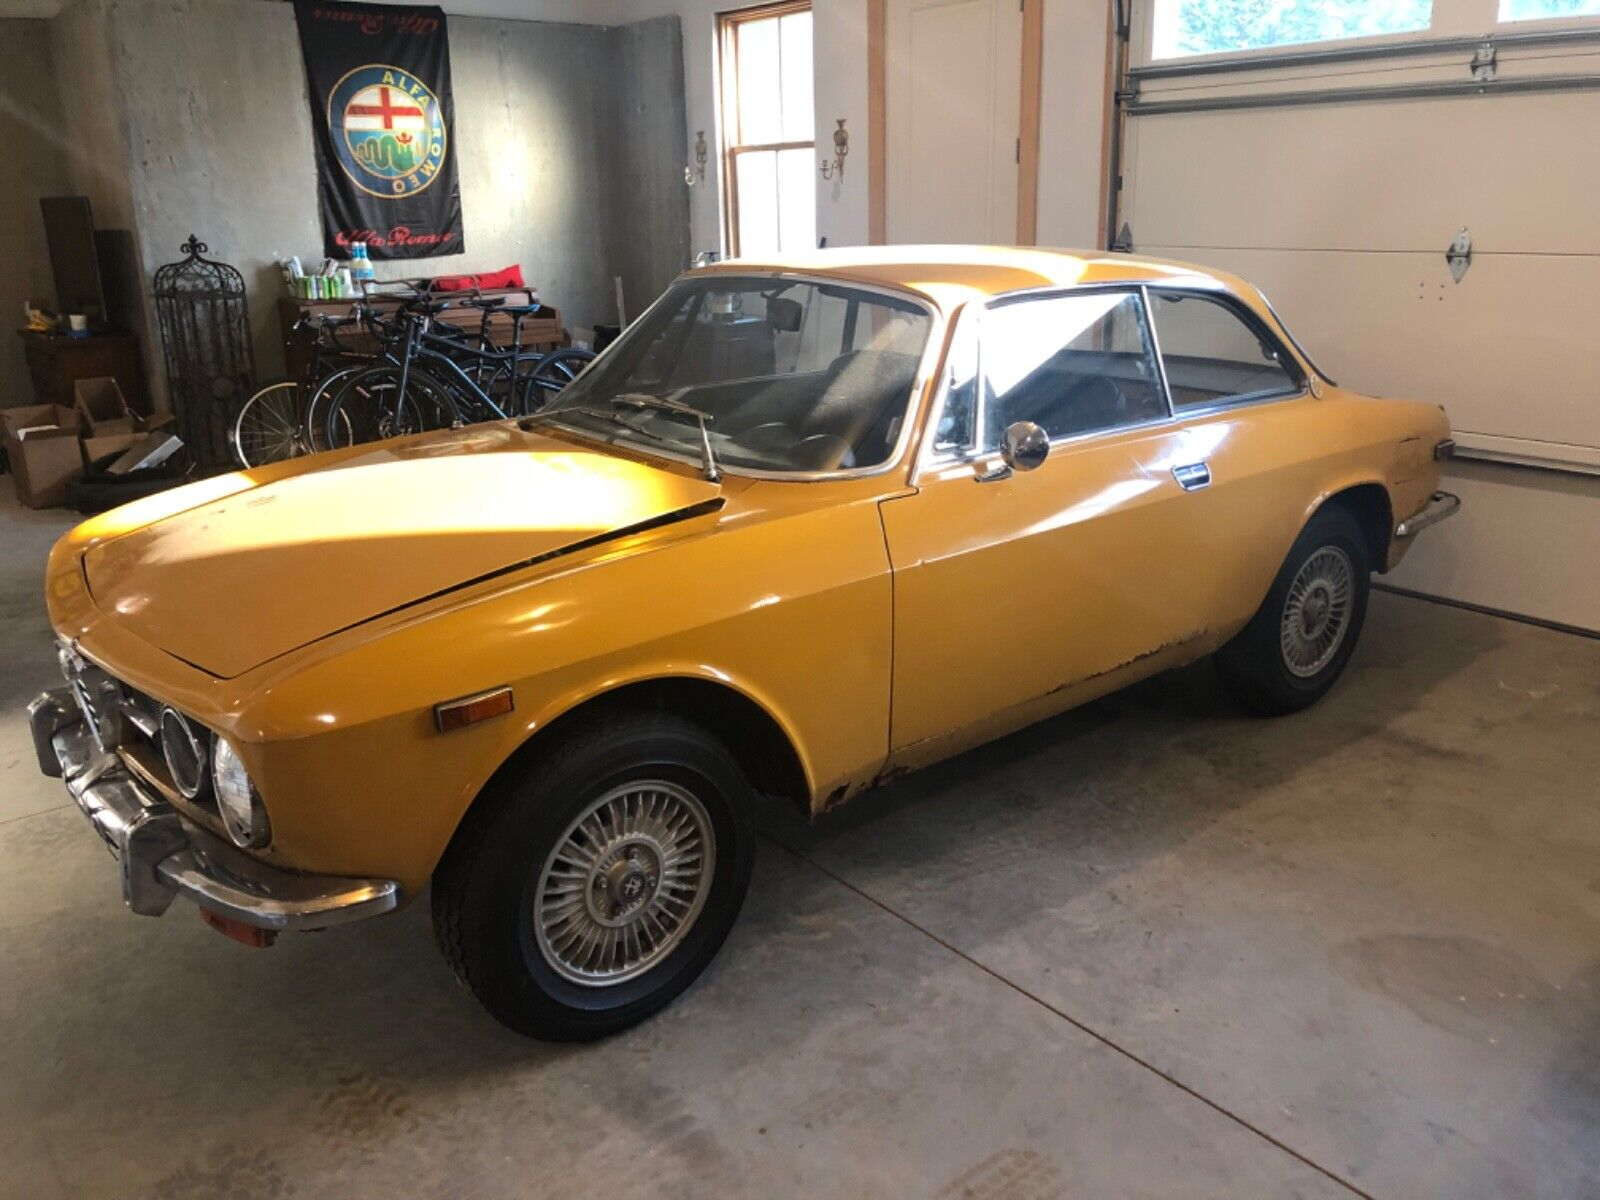 1971 Alfa Romeo GTV  1971 Alfa Romeo GTV 1750 Ocra Yellow Barn Find 105 series